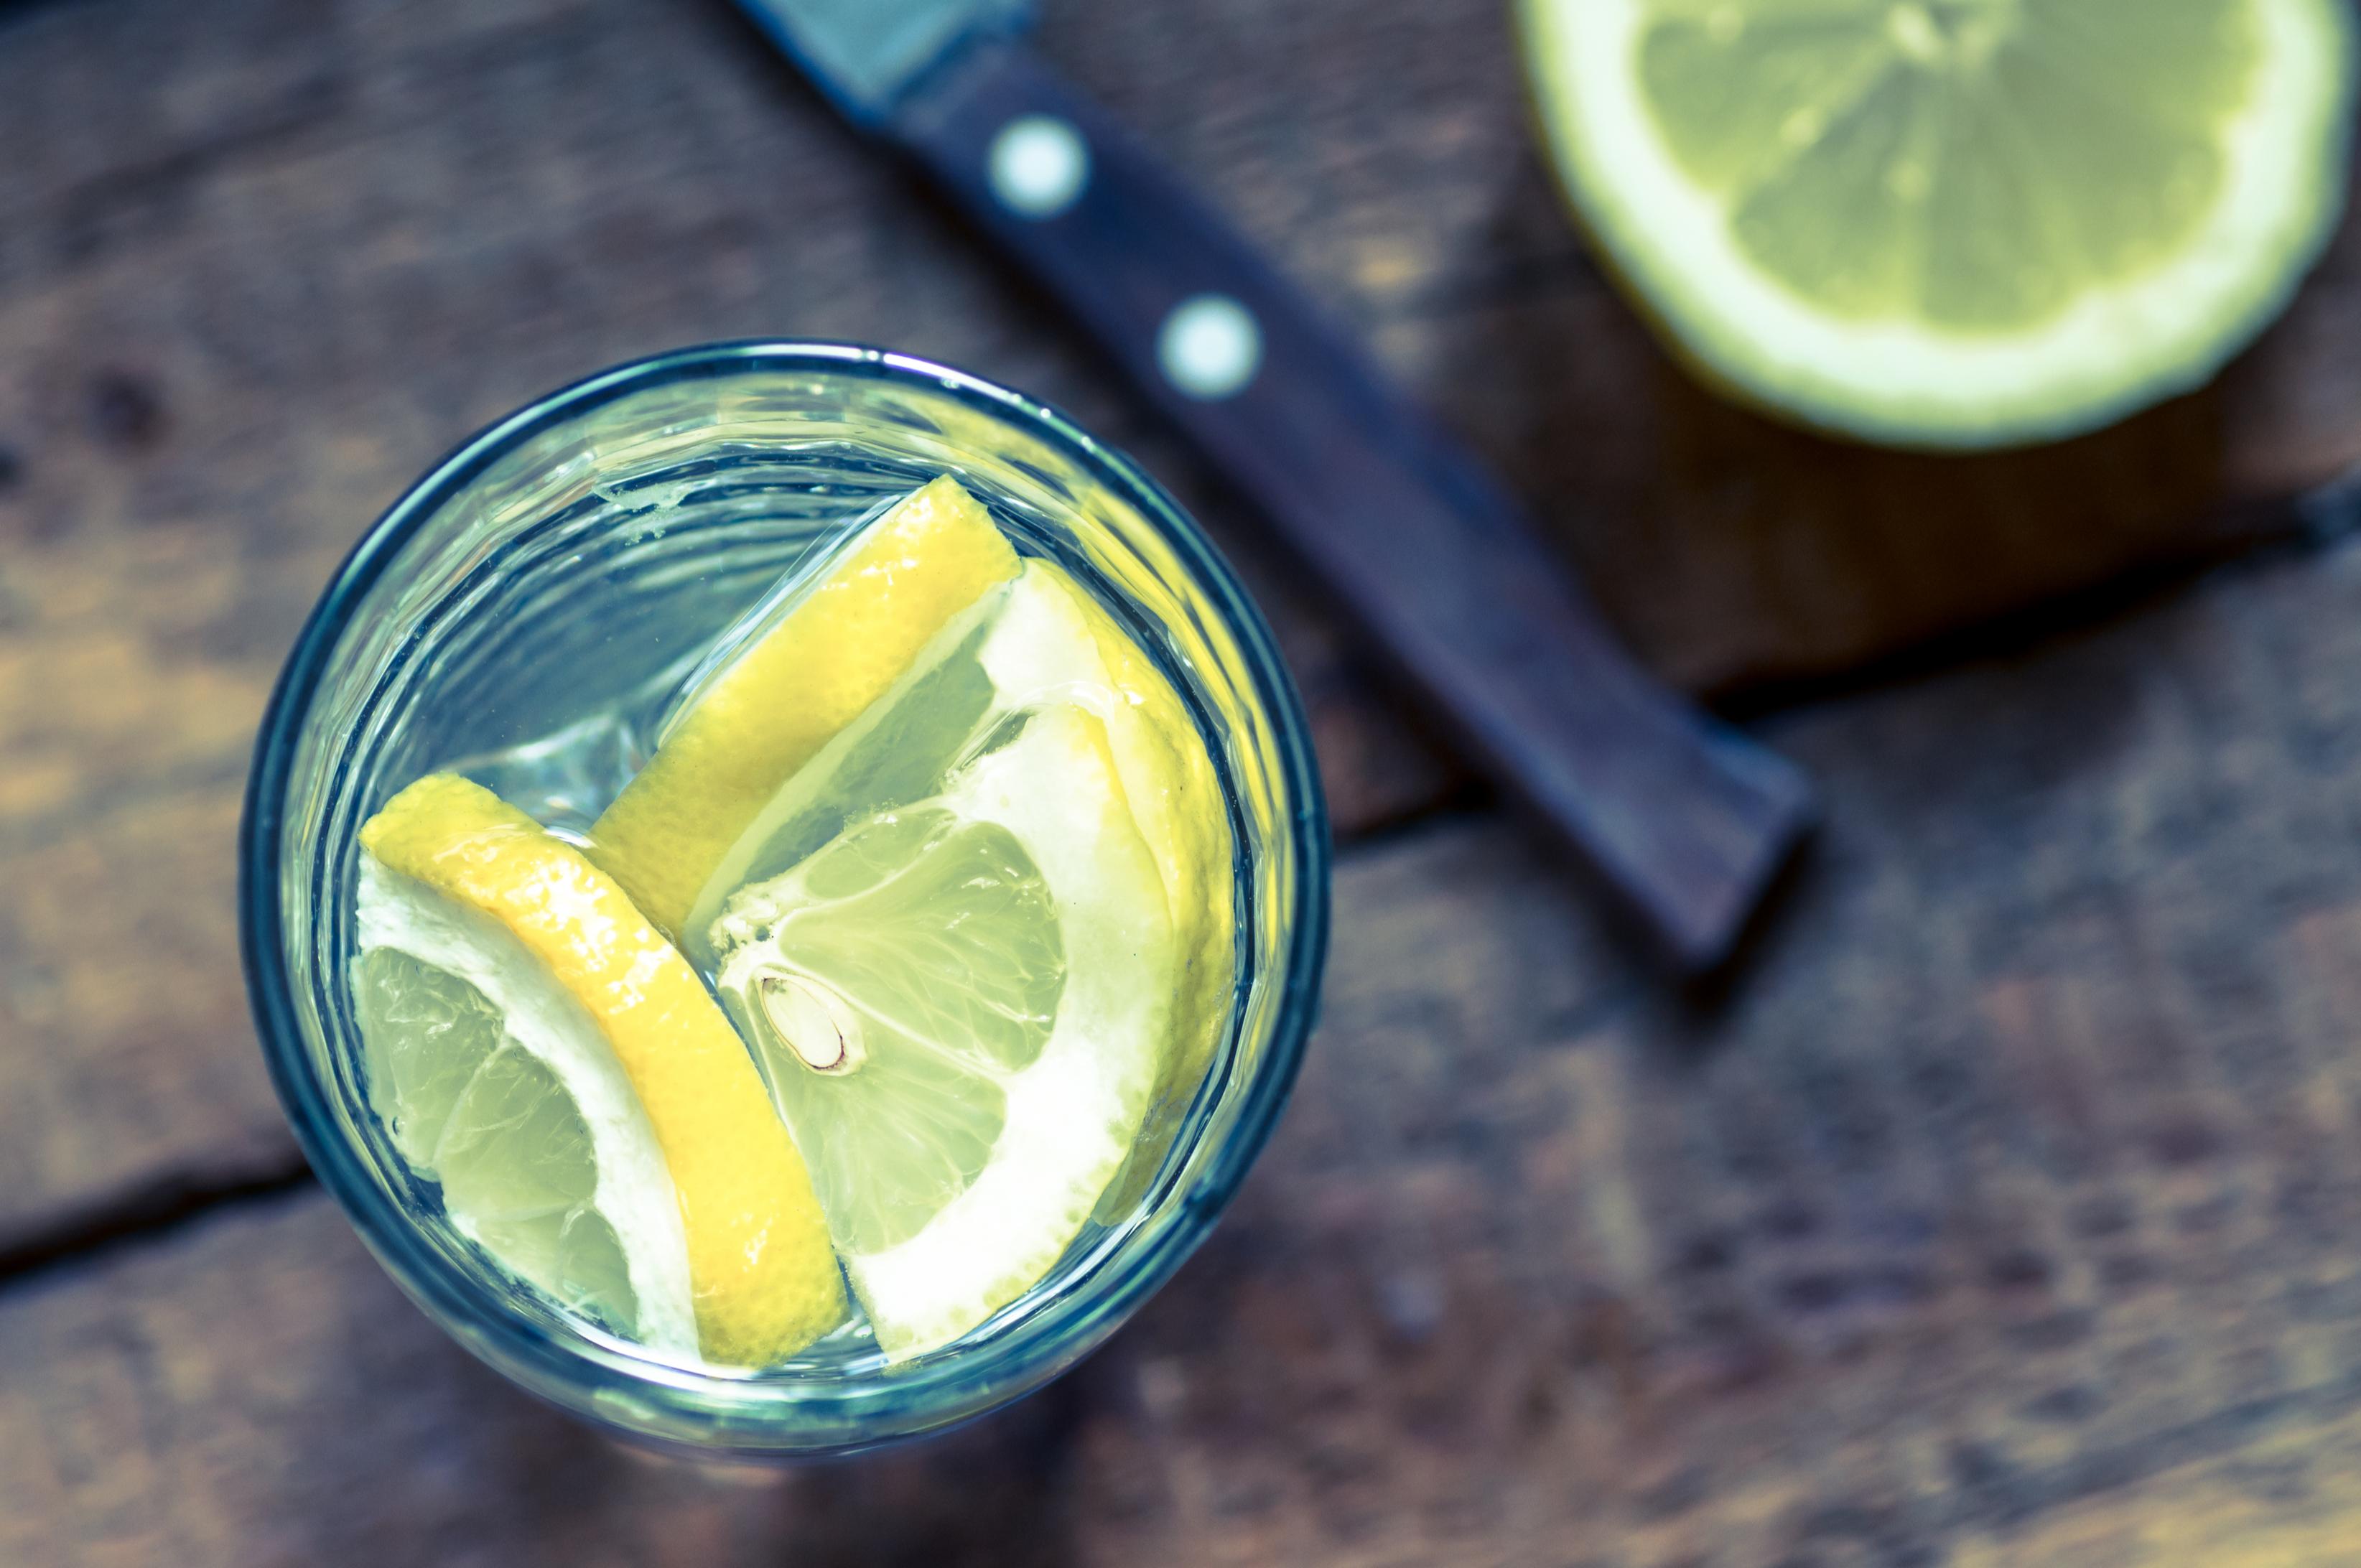 lemon water   lemon   water   lemon water benefits   health   health benefits   health benefits of lemon water